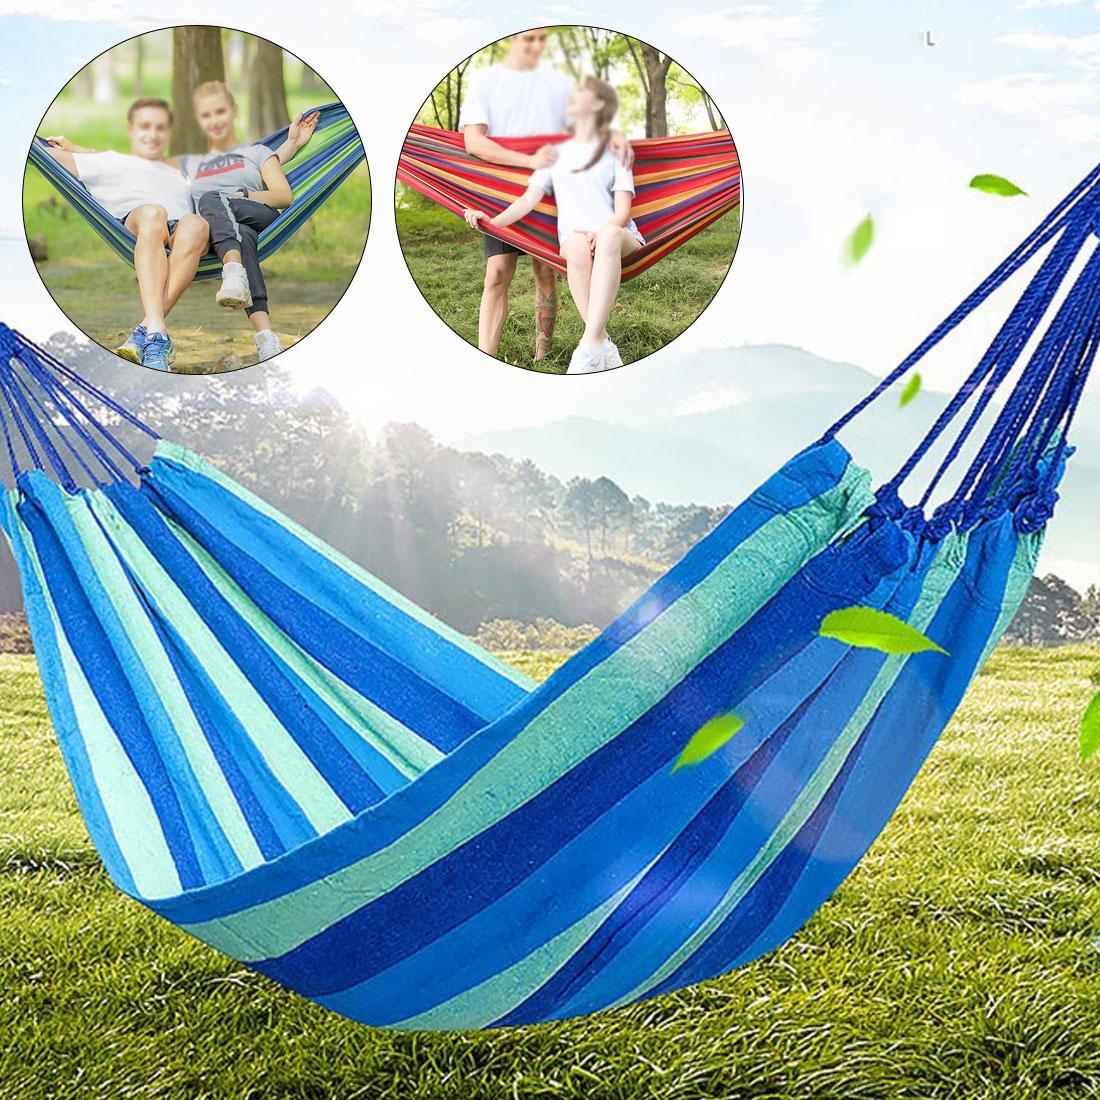 Canvas hammock portable hammock 150 kg load-bearing outdoor hammock 1 set single family travel camping swing striped hammock